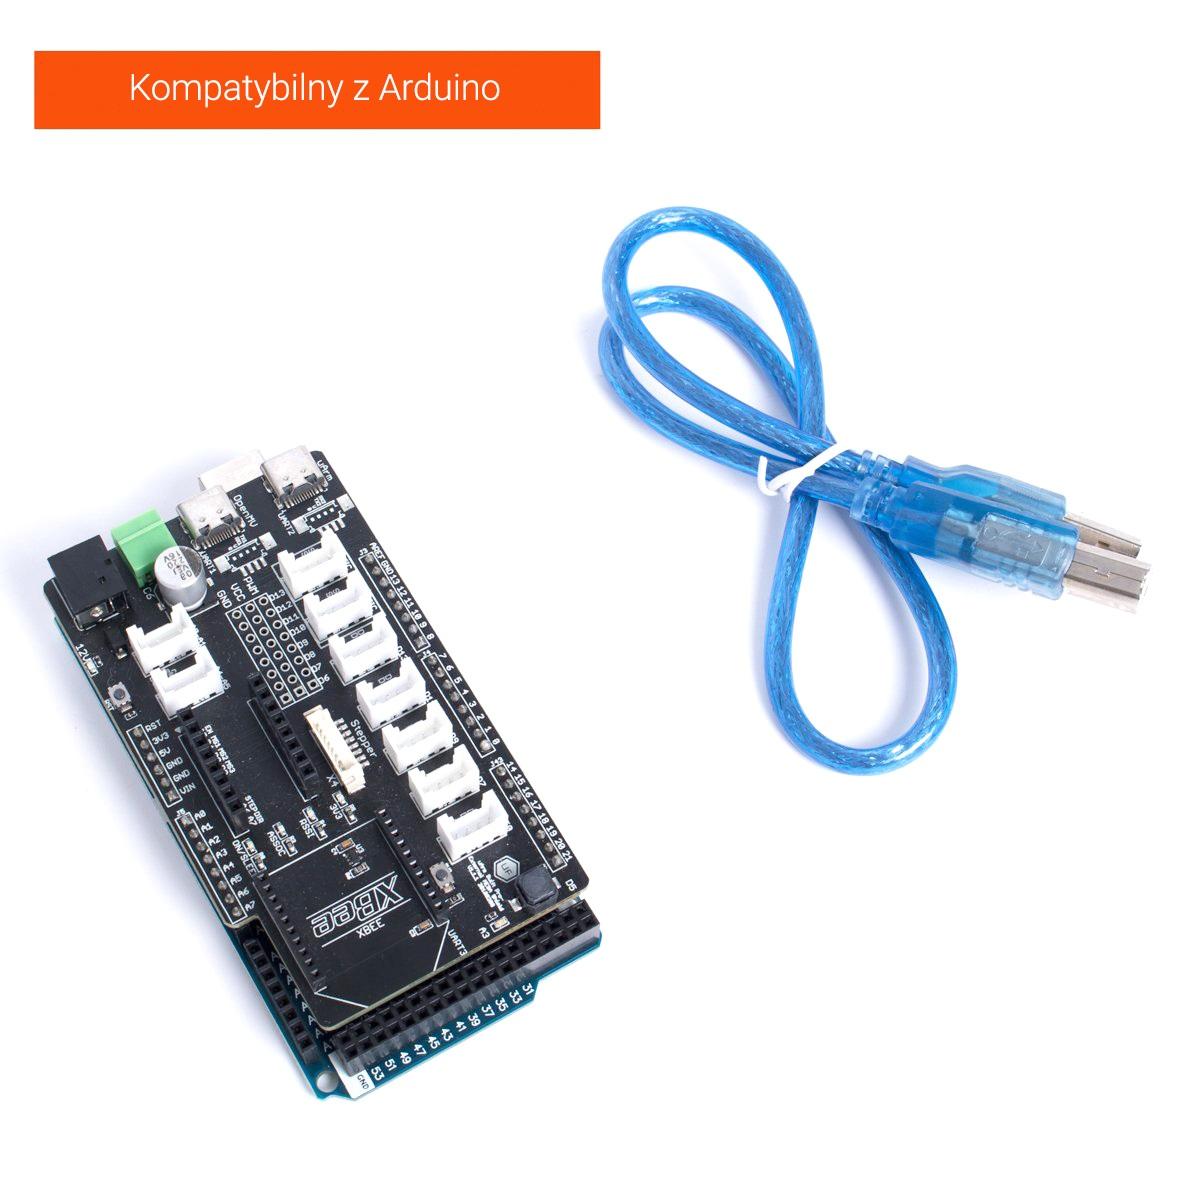 kompatybilny z Arduino